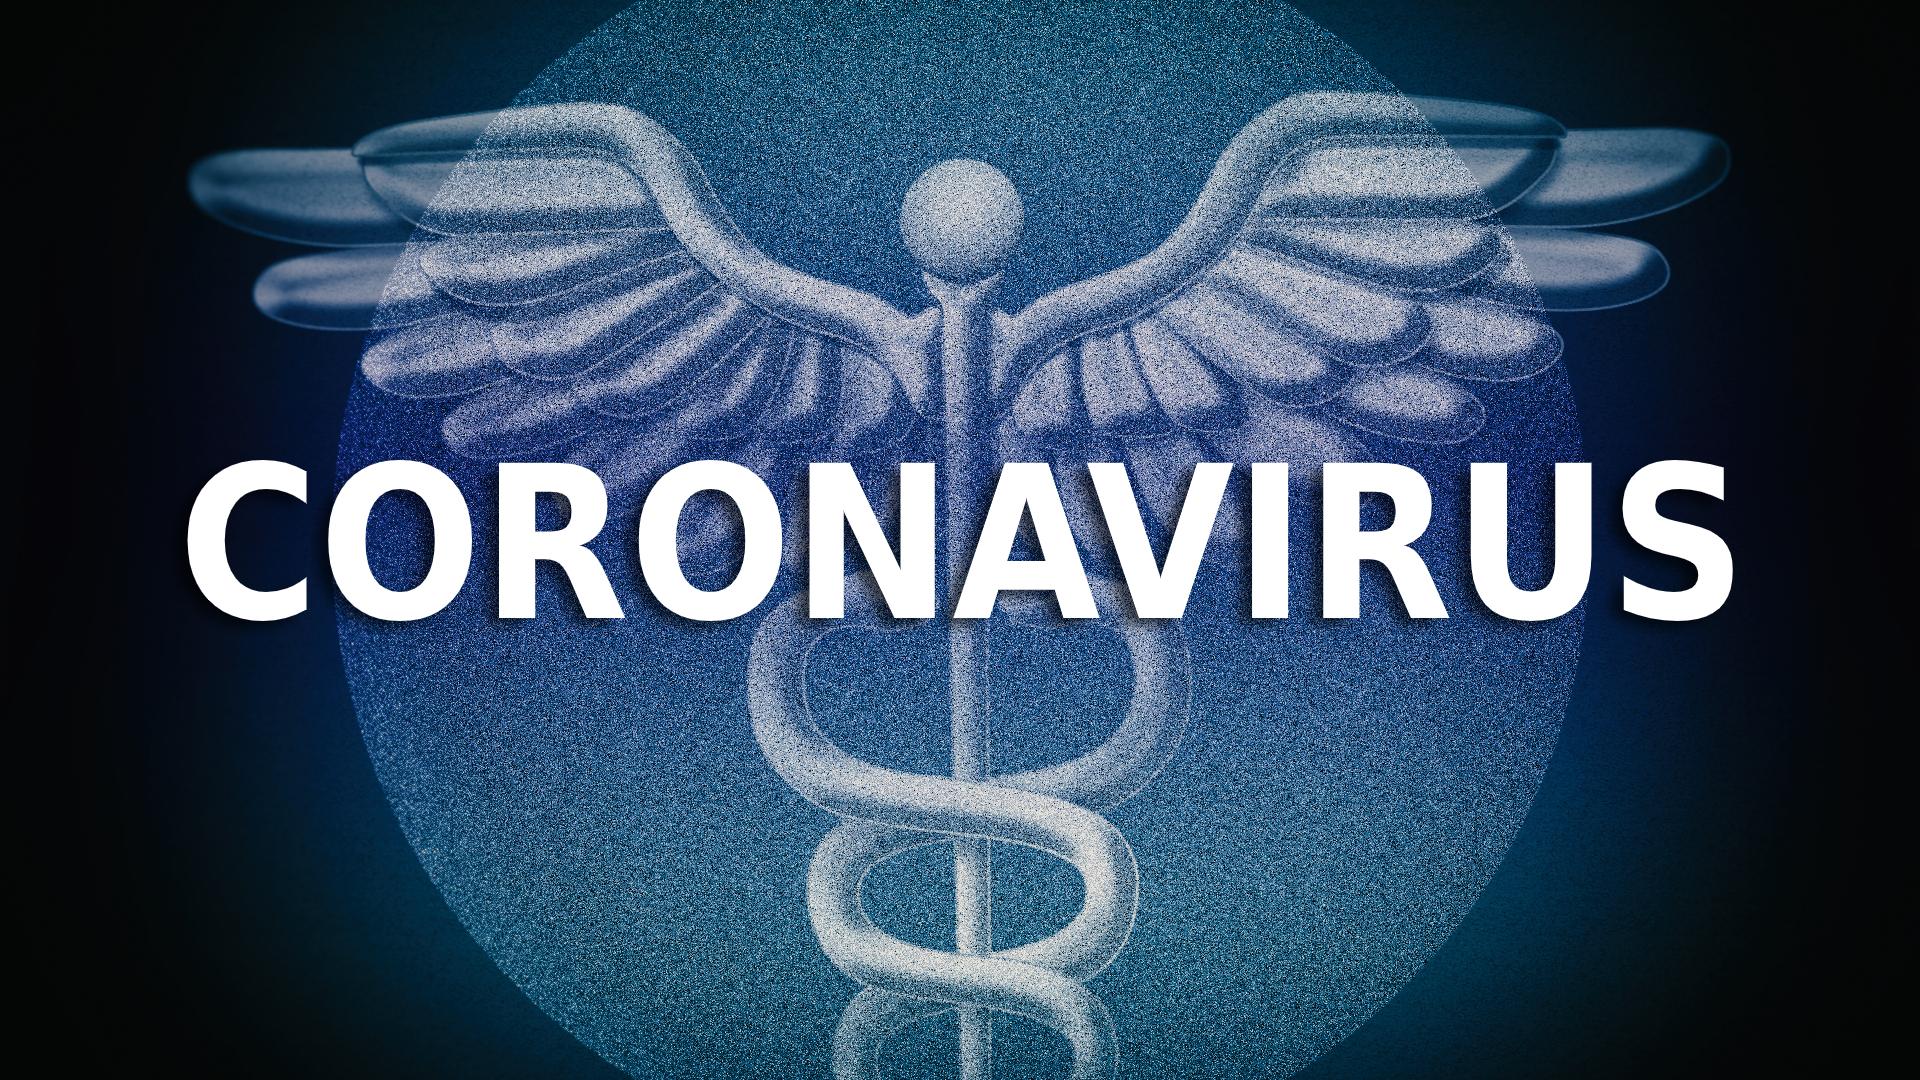 Health officials investigating coronavirus